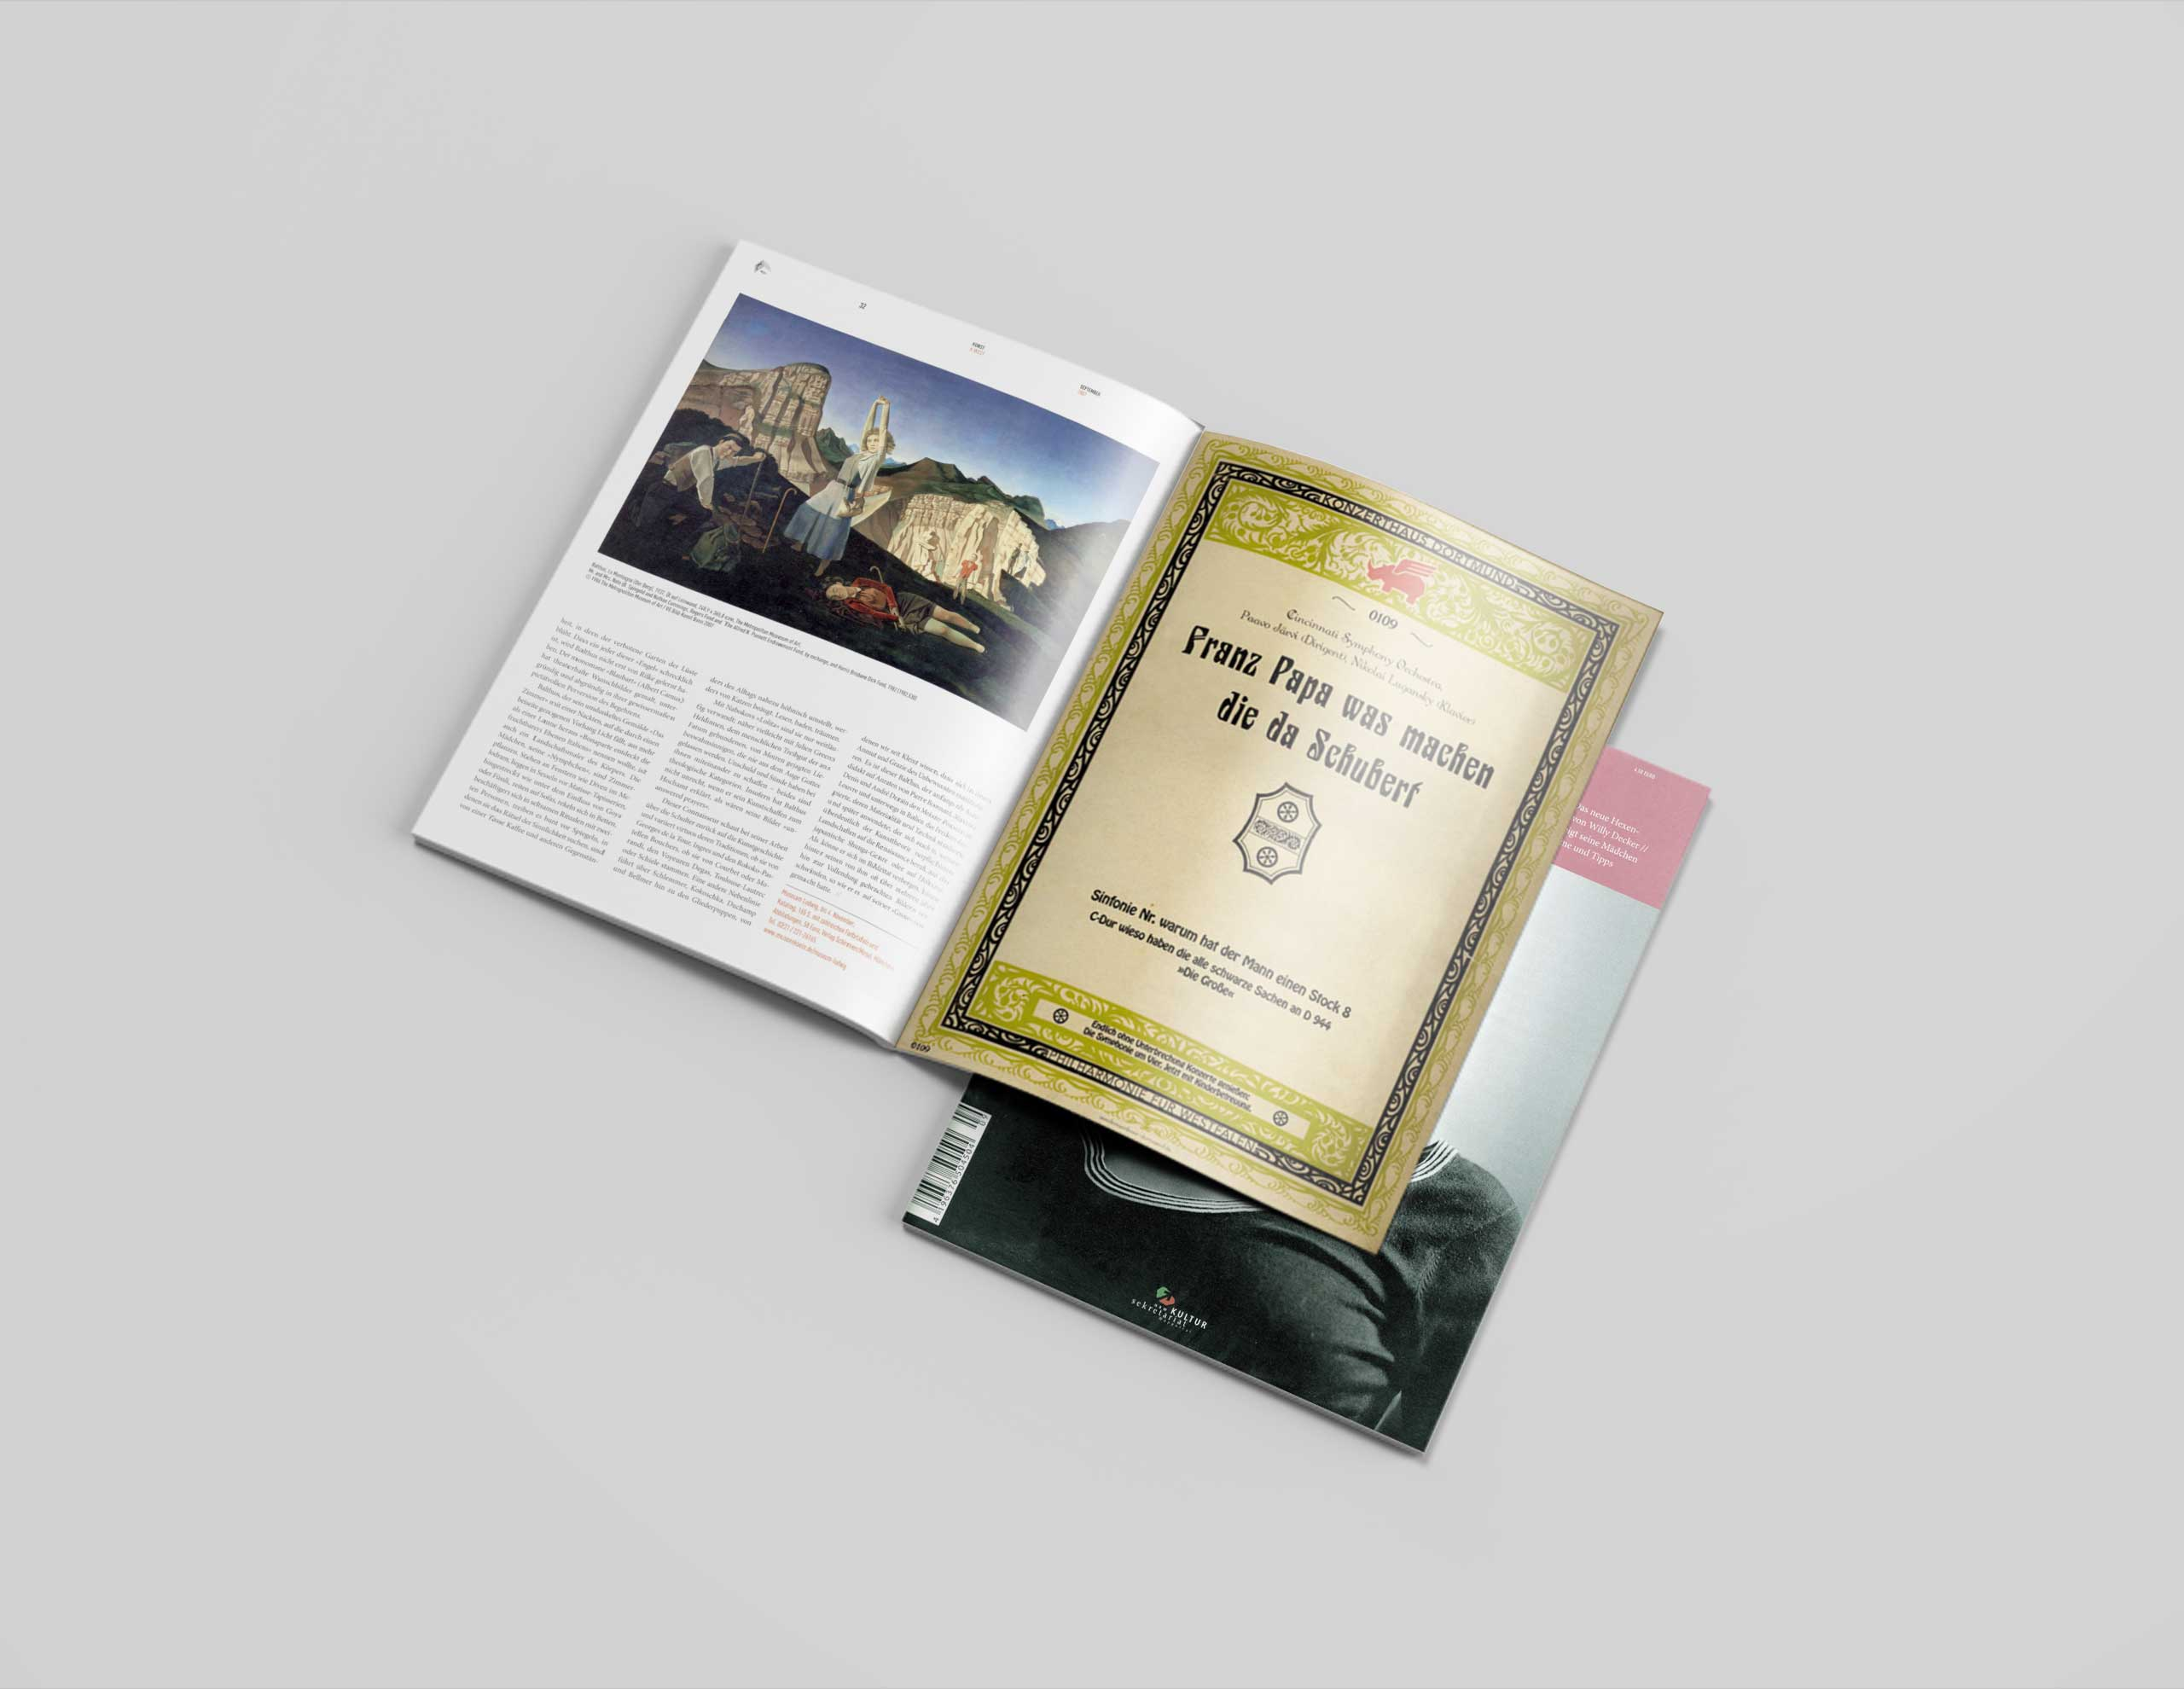 191216_KHD_Letter-Magazine-Mockup—Free-Version_2560x1980_4